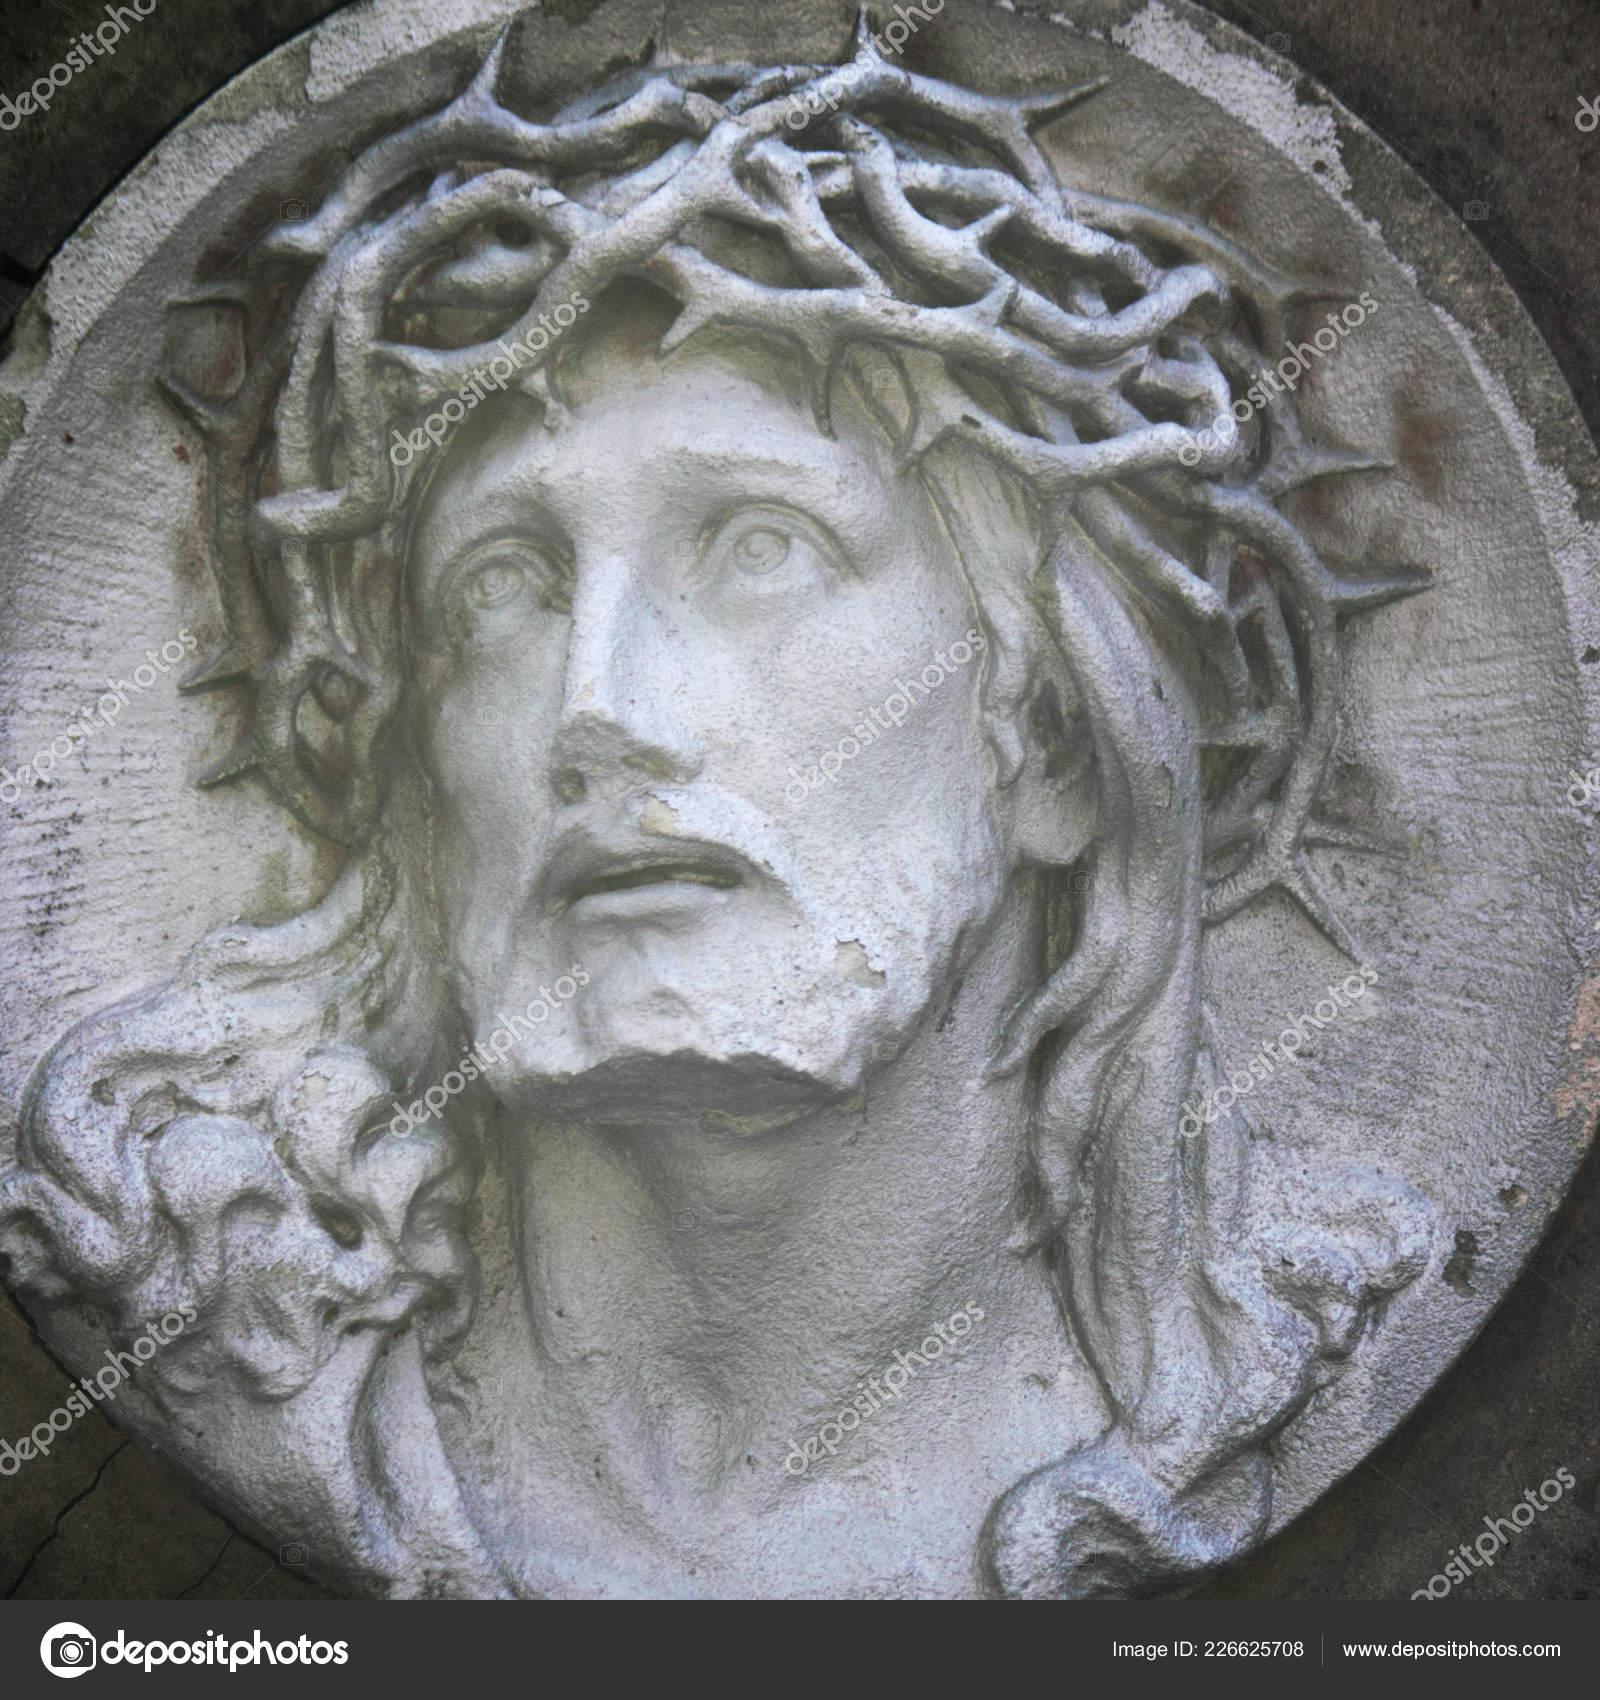 https://st4.depositphotos.com/1030973/22662/i/1600/depositphotos_226625708-stock-photo-jesus-christ-crown-thorns-fragment.jpg